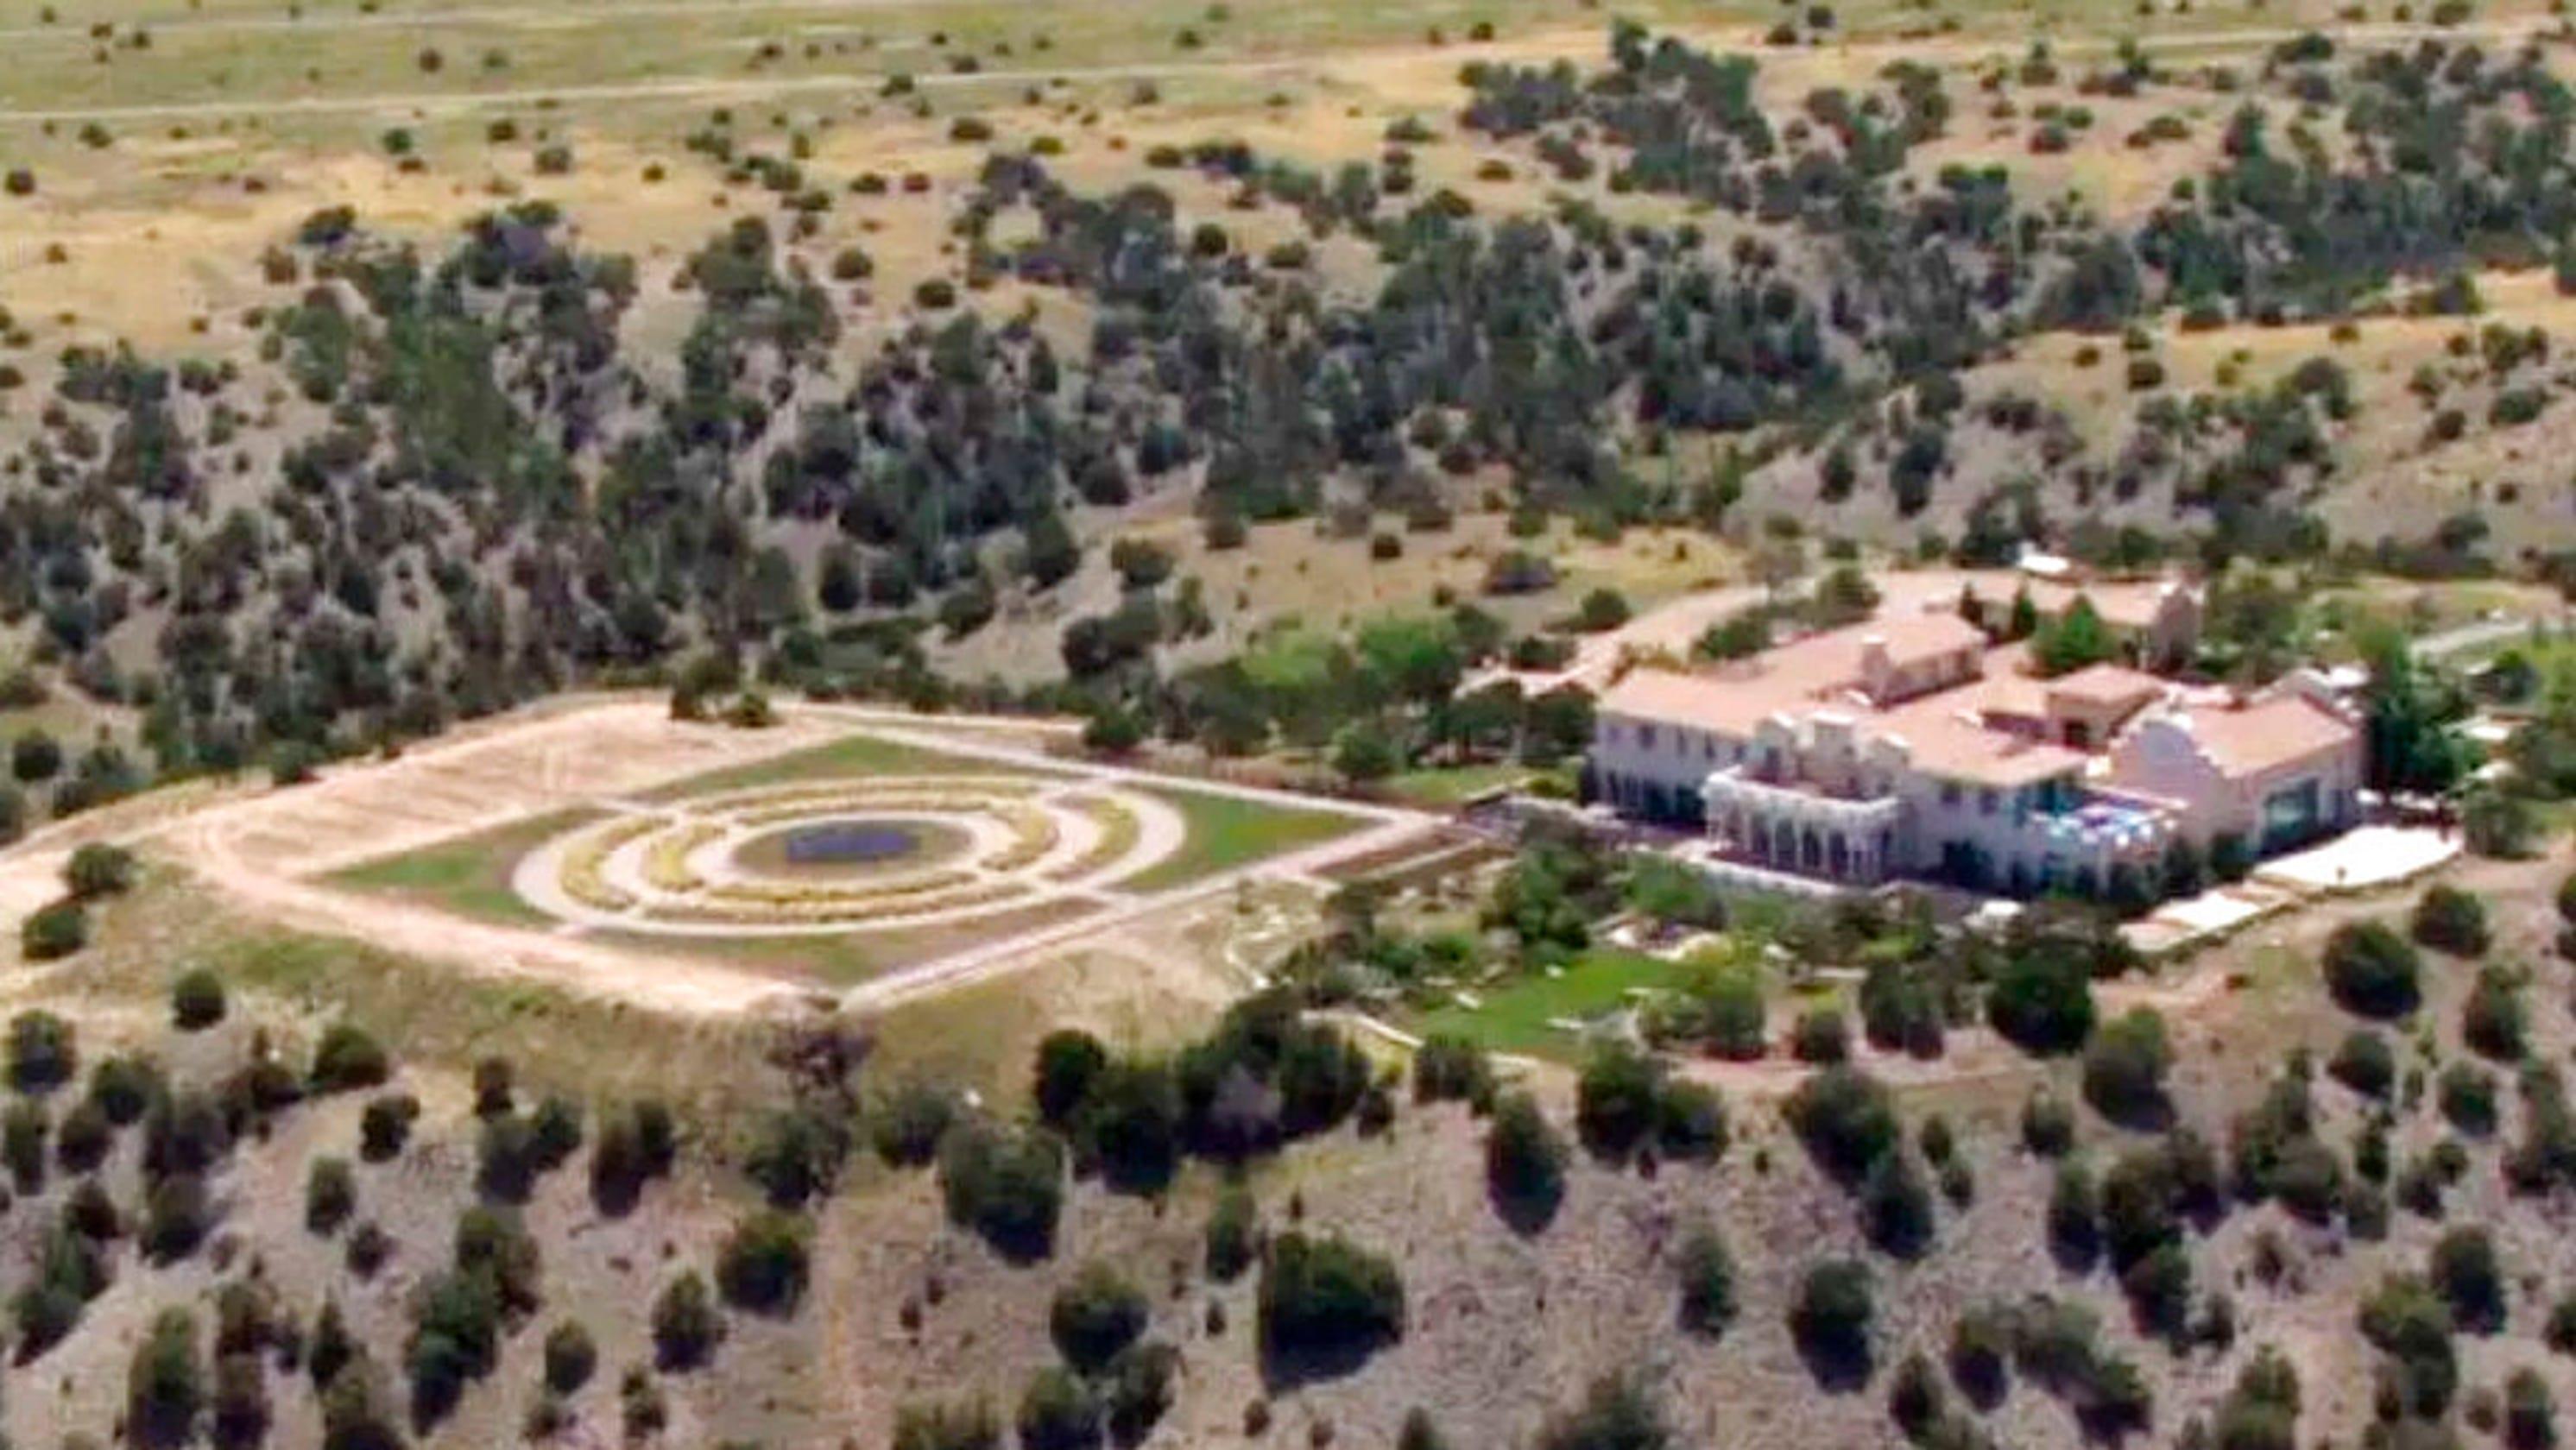 Jeffrey Epstein's Zorro Ranch in New Mexico linked to